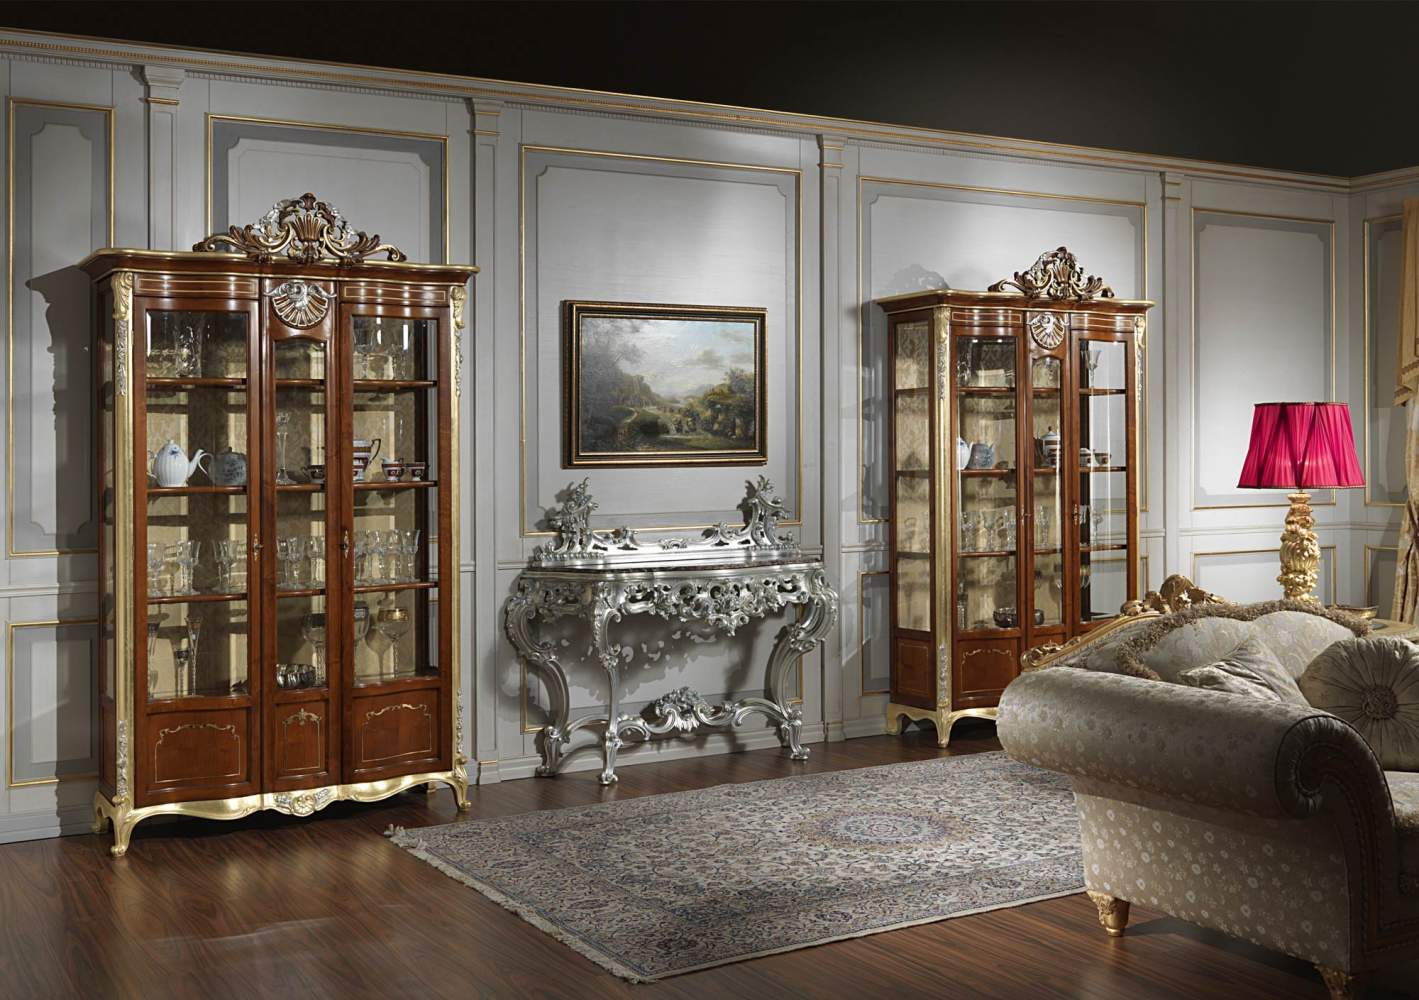 Mobile vetrina per soggiorno in stile classico  Vimercati Meda